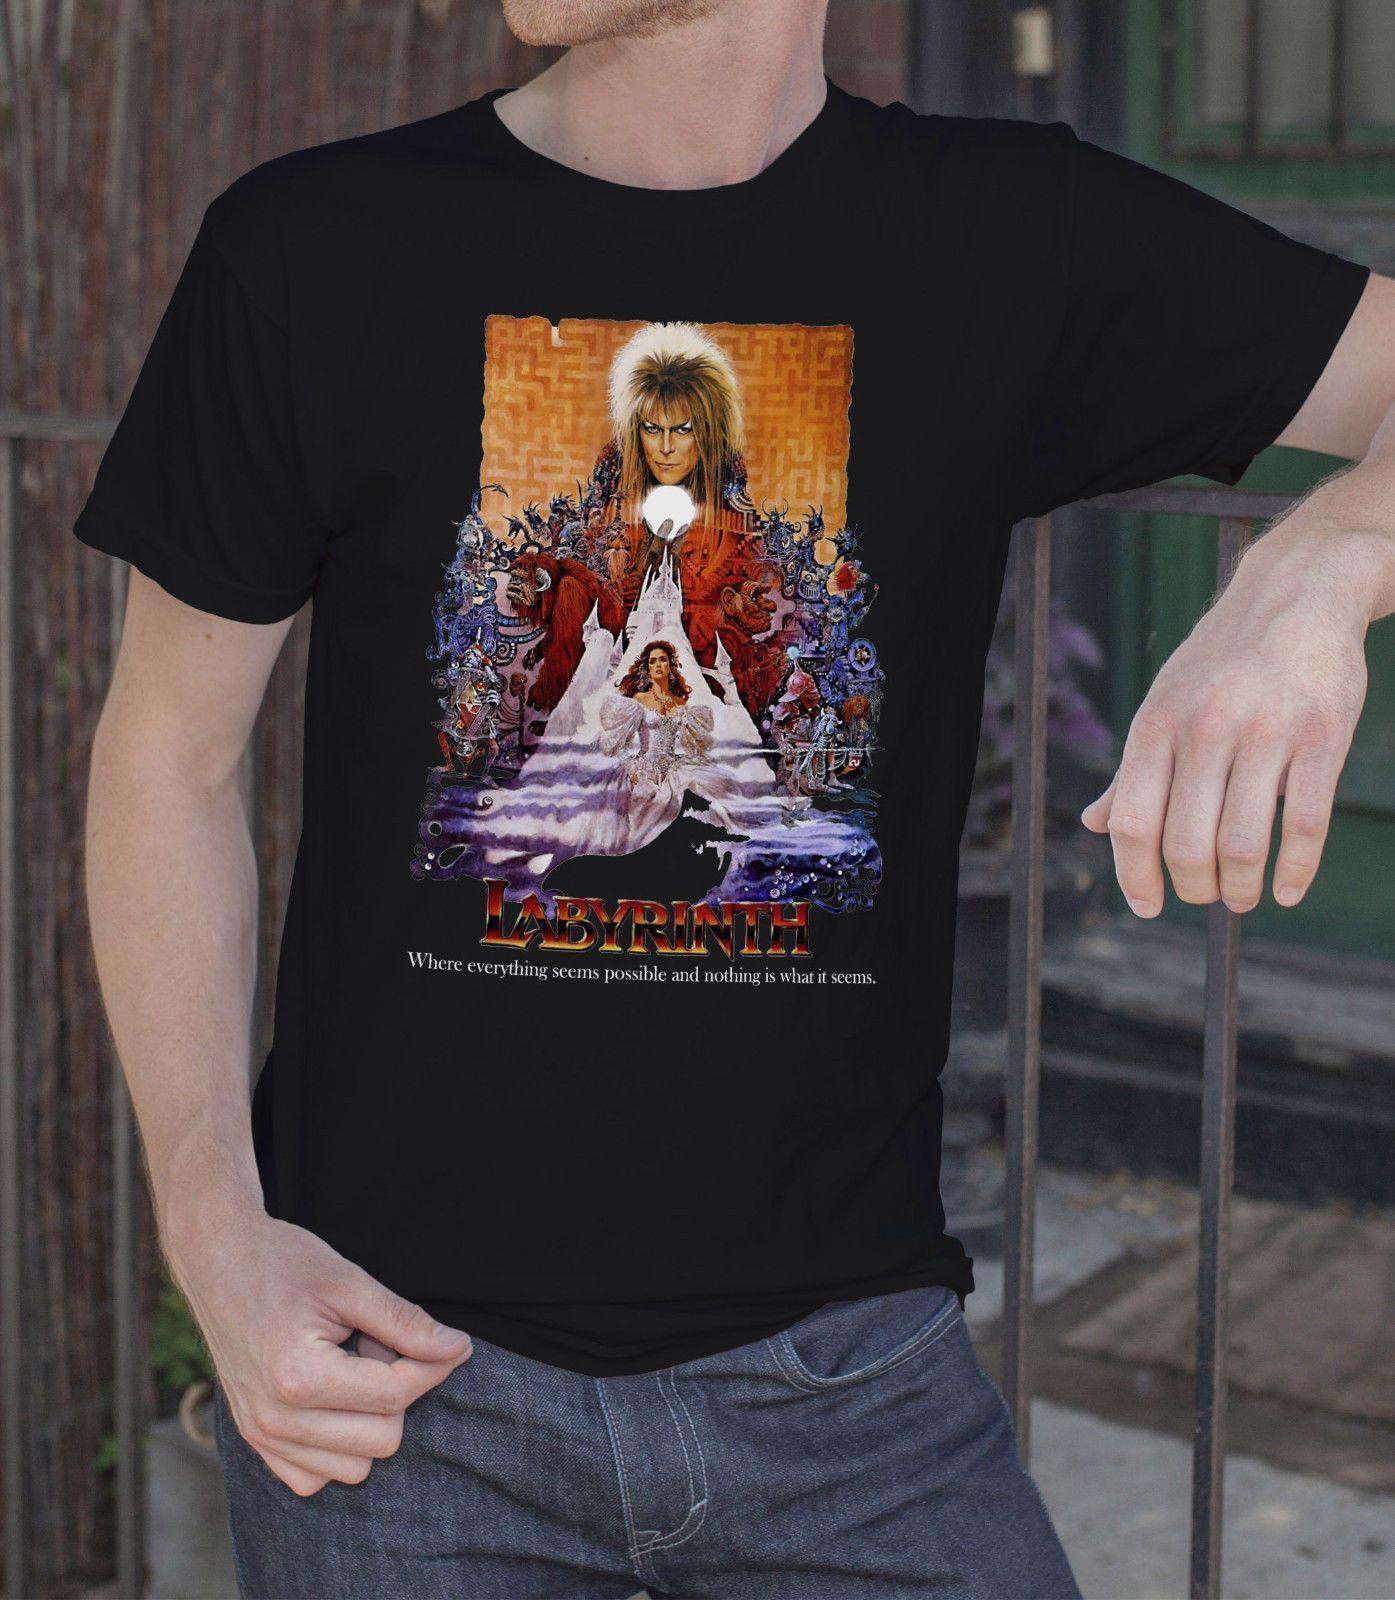 52ca1620eb7 David Bowie T-shirt Rock Tee Shirt Labyrinth Movie MENS T-SHIRT Tee ...